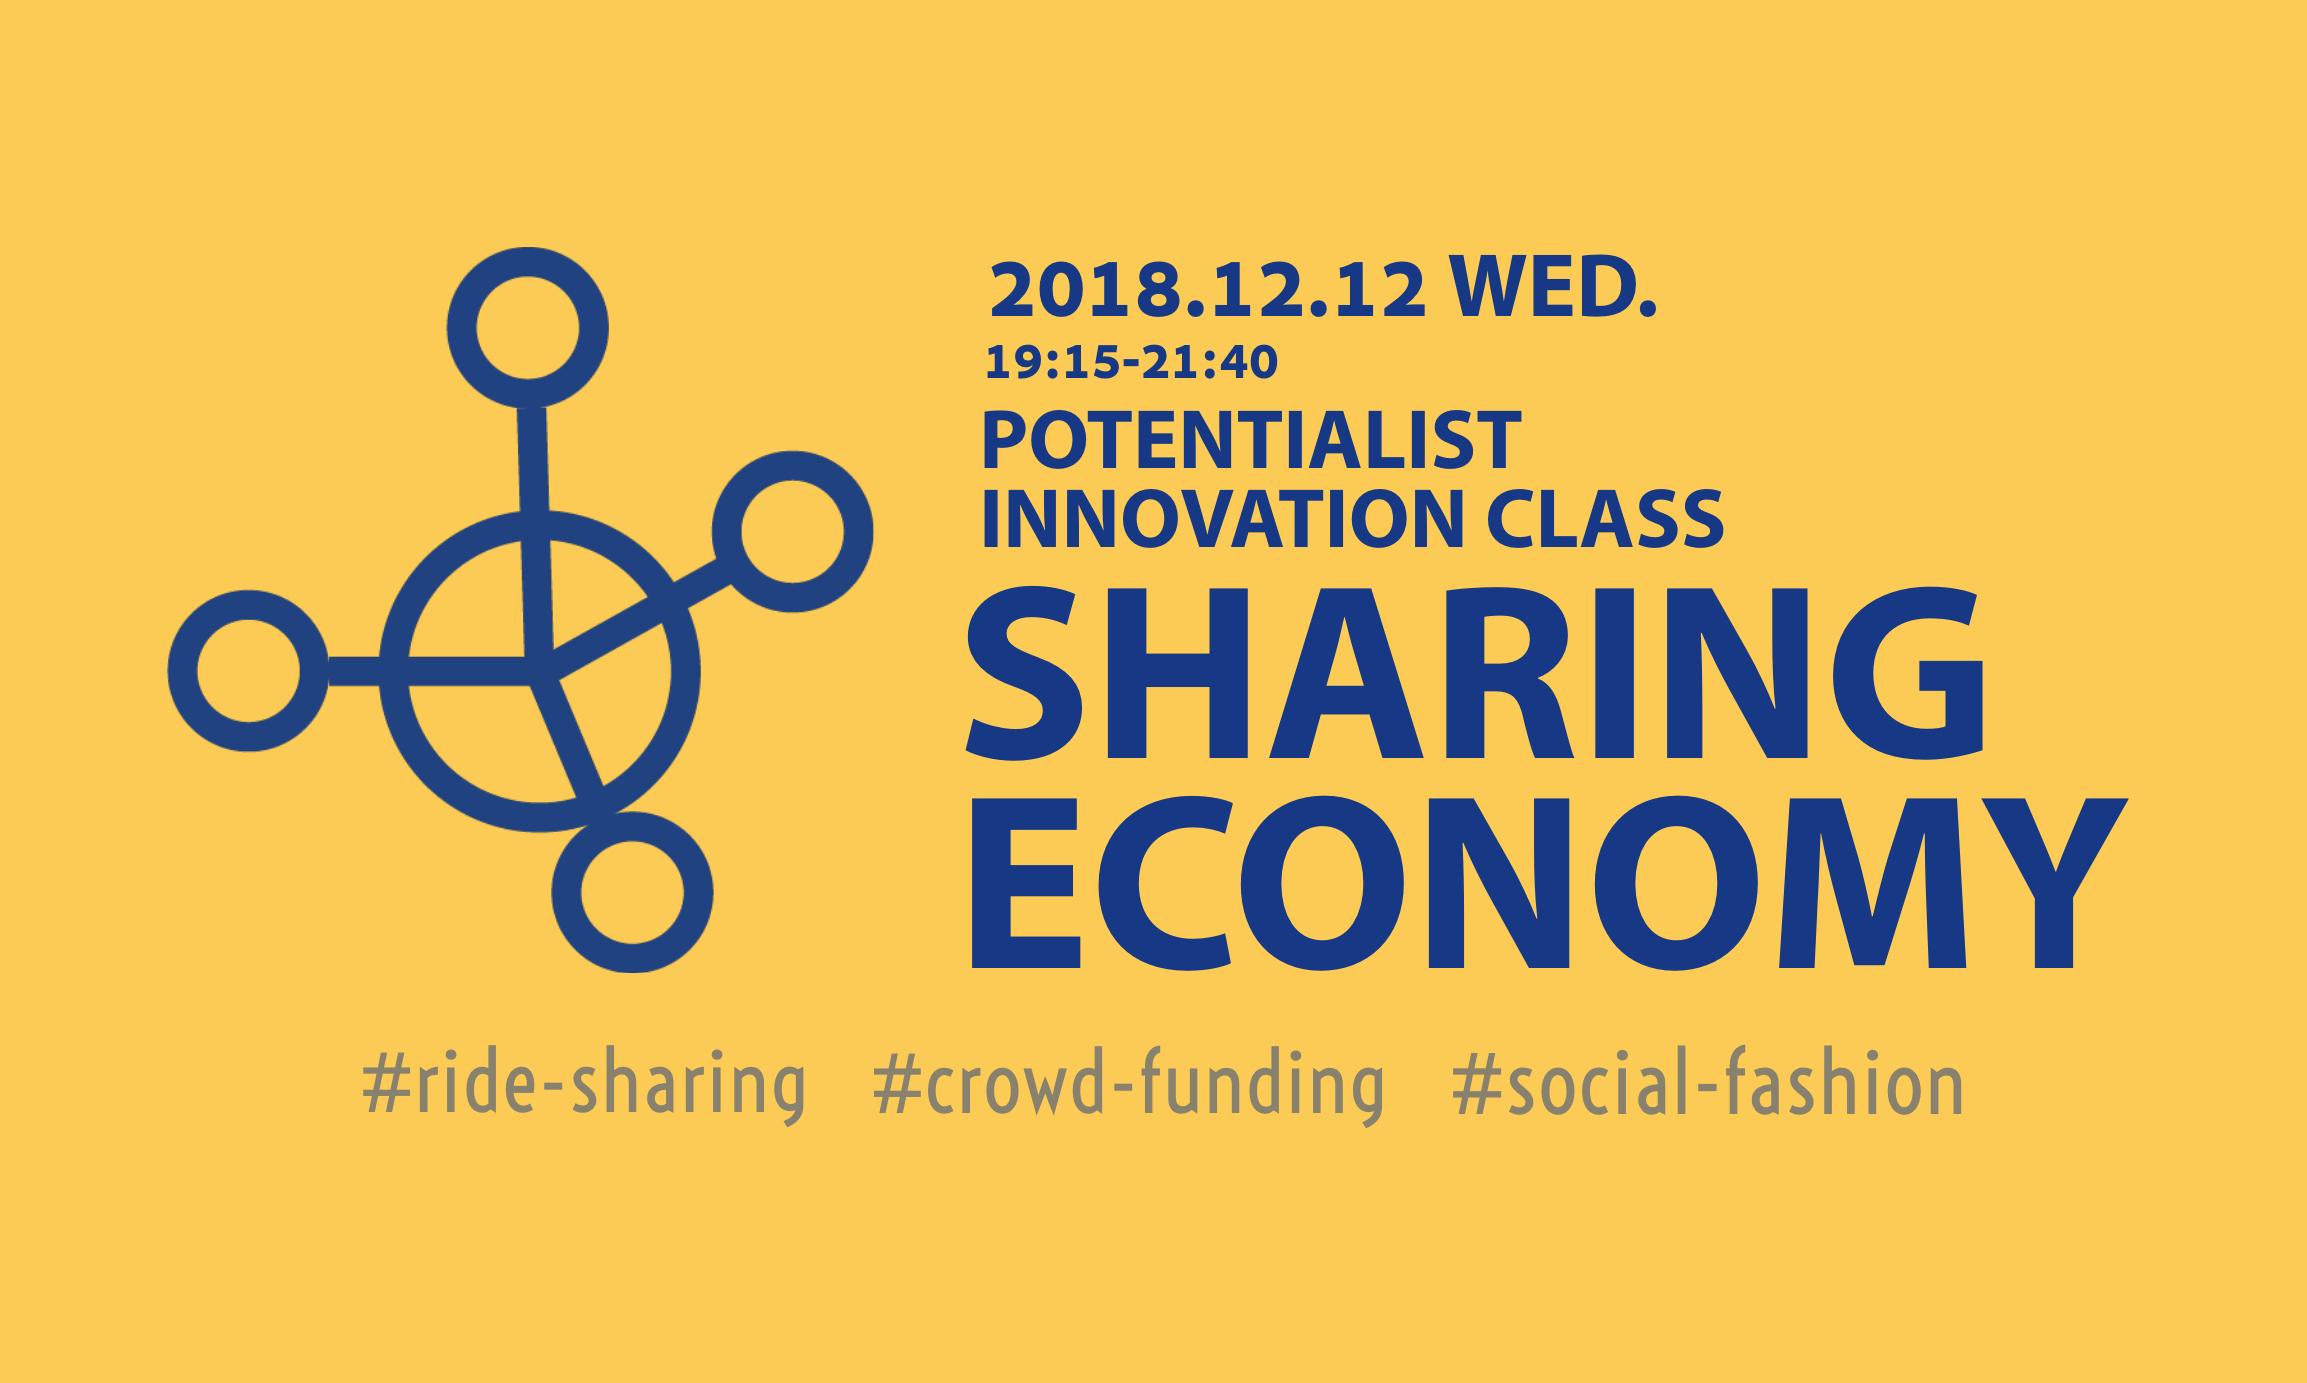 sharing economy バナー